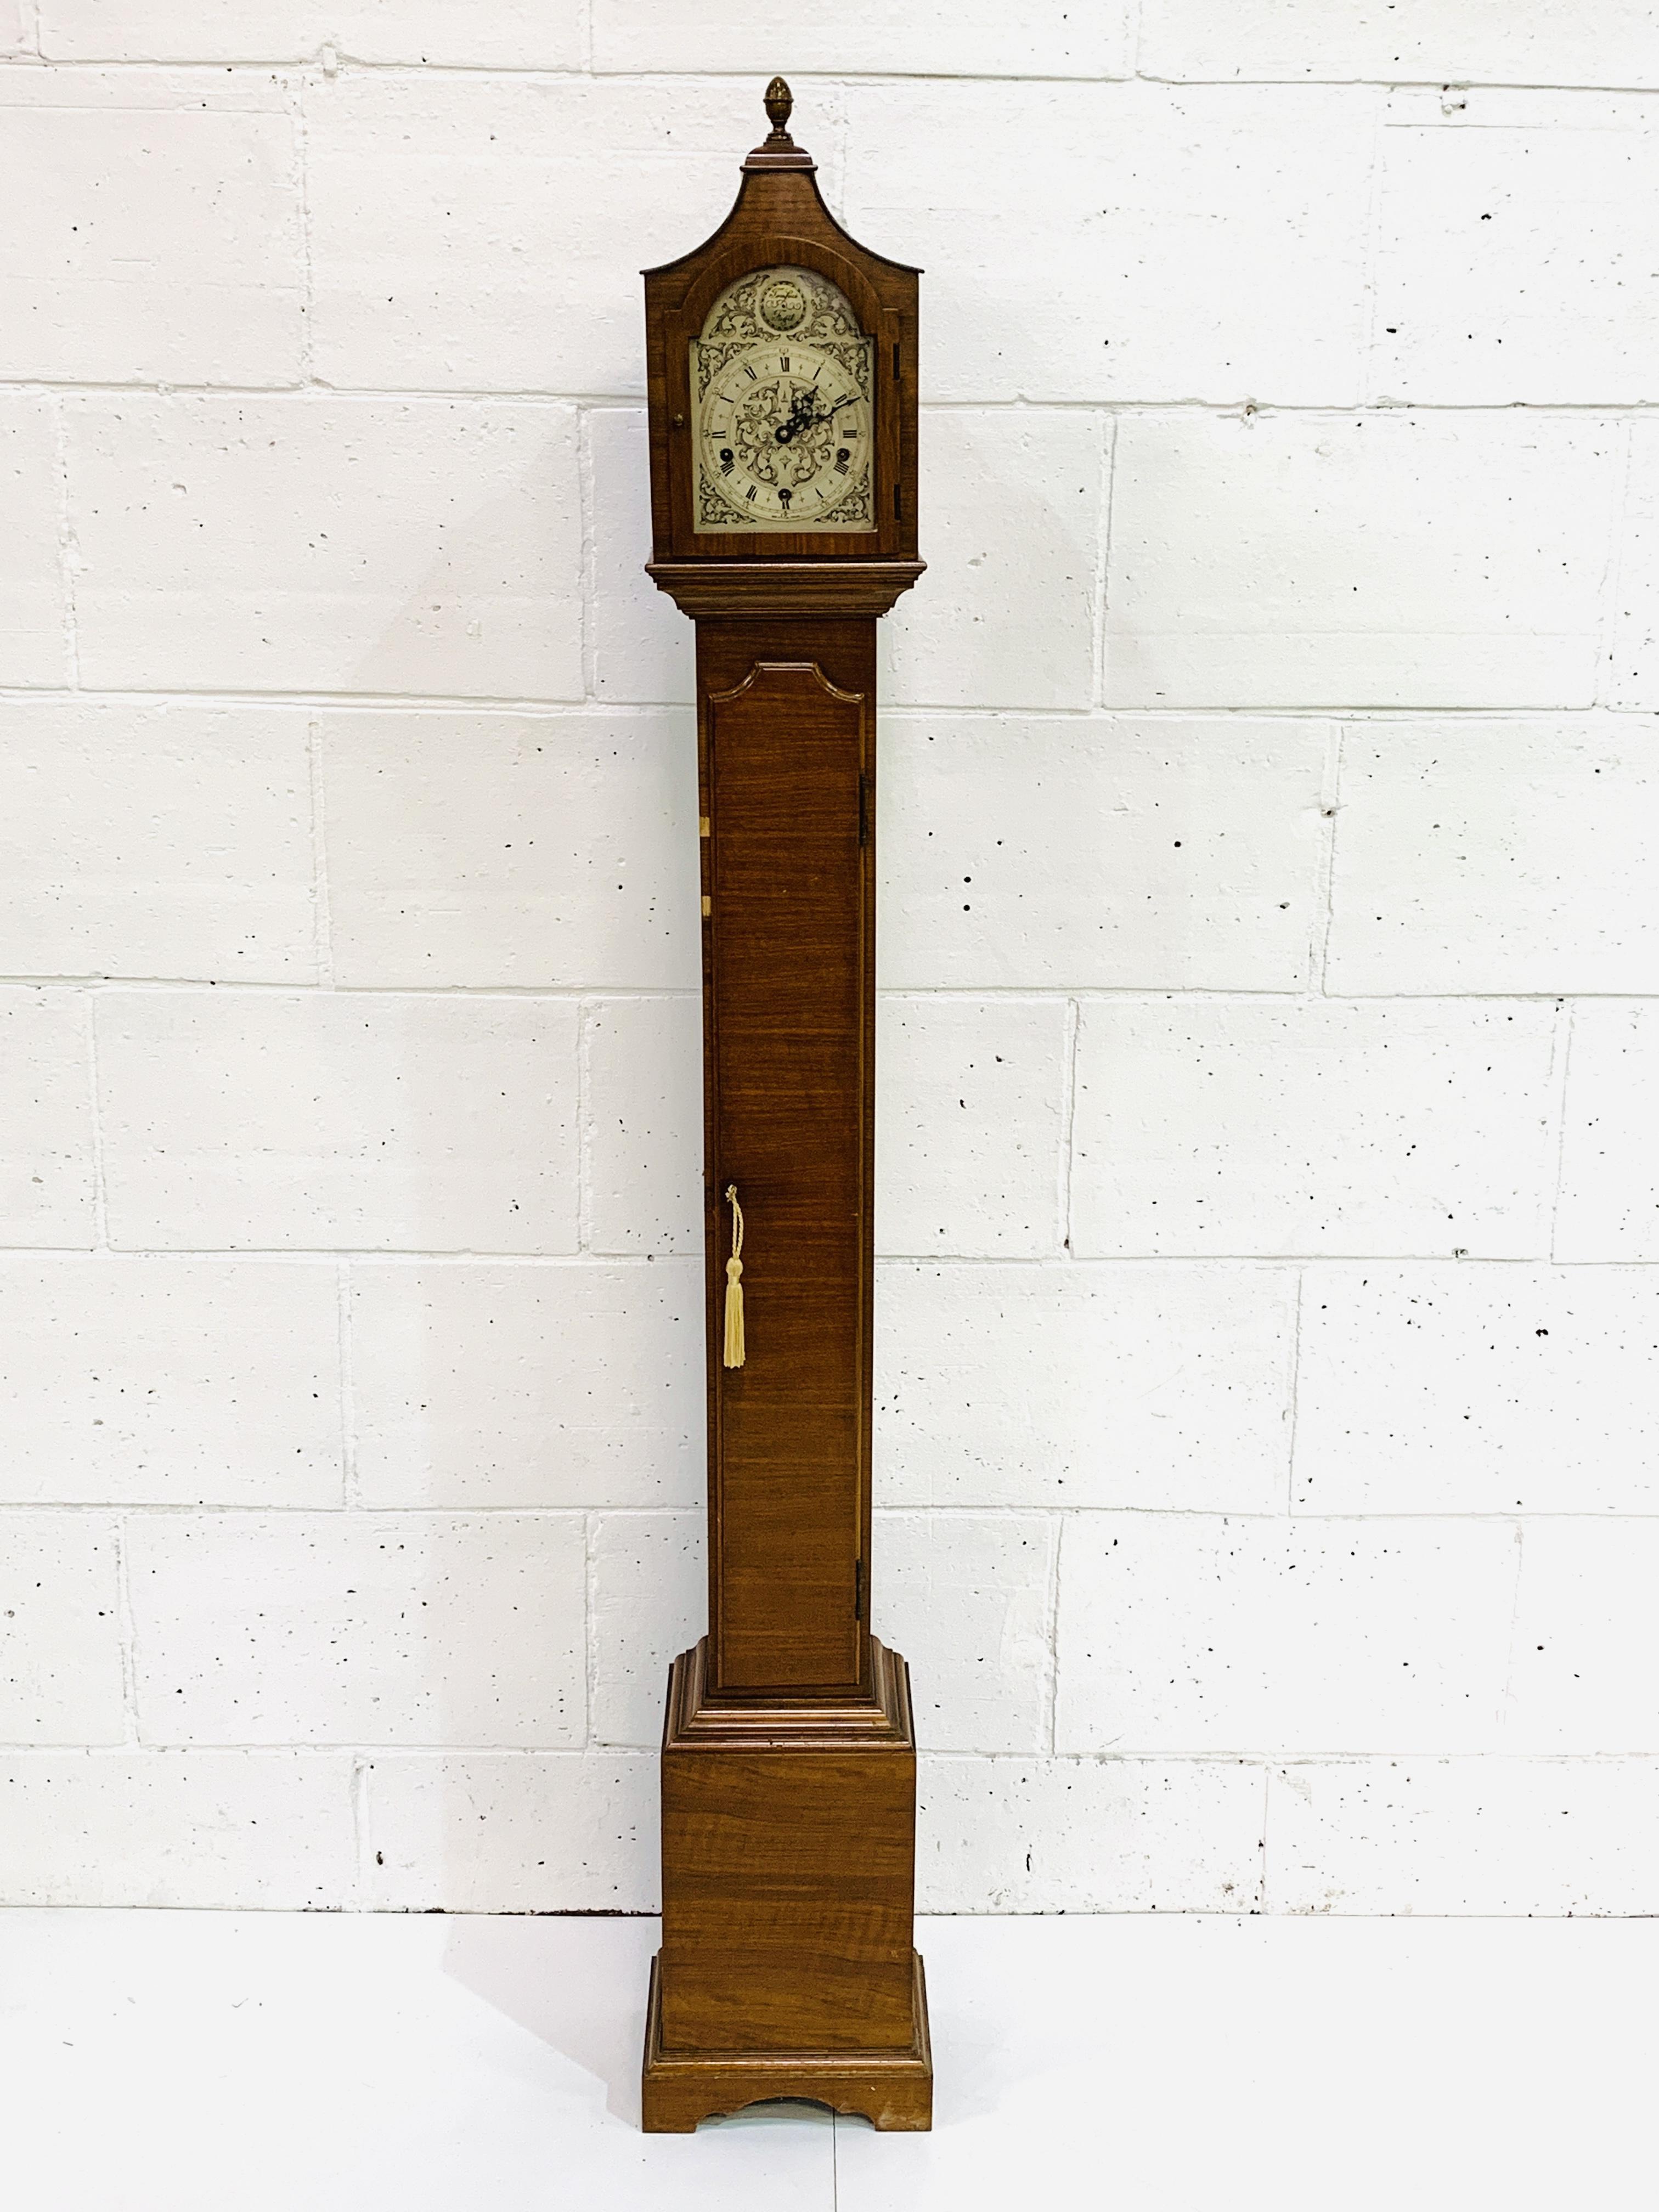 Mahogany veneer cased Grandmother clock